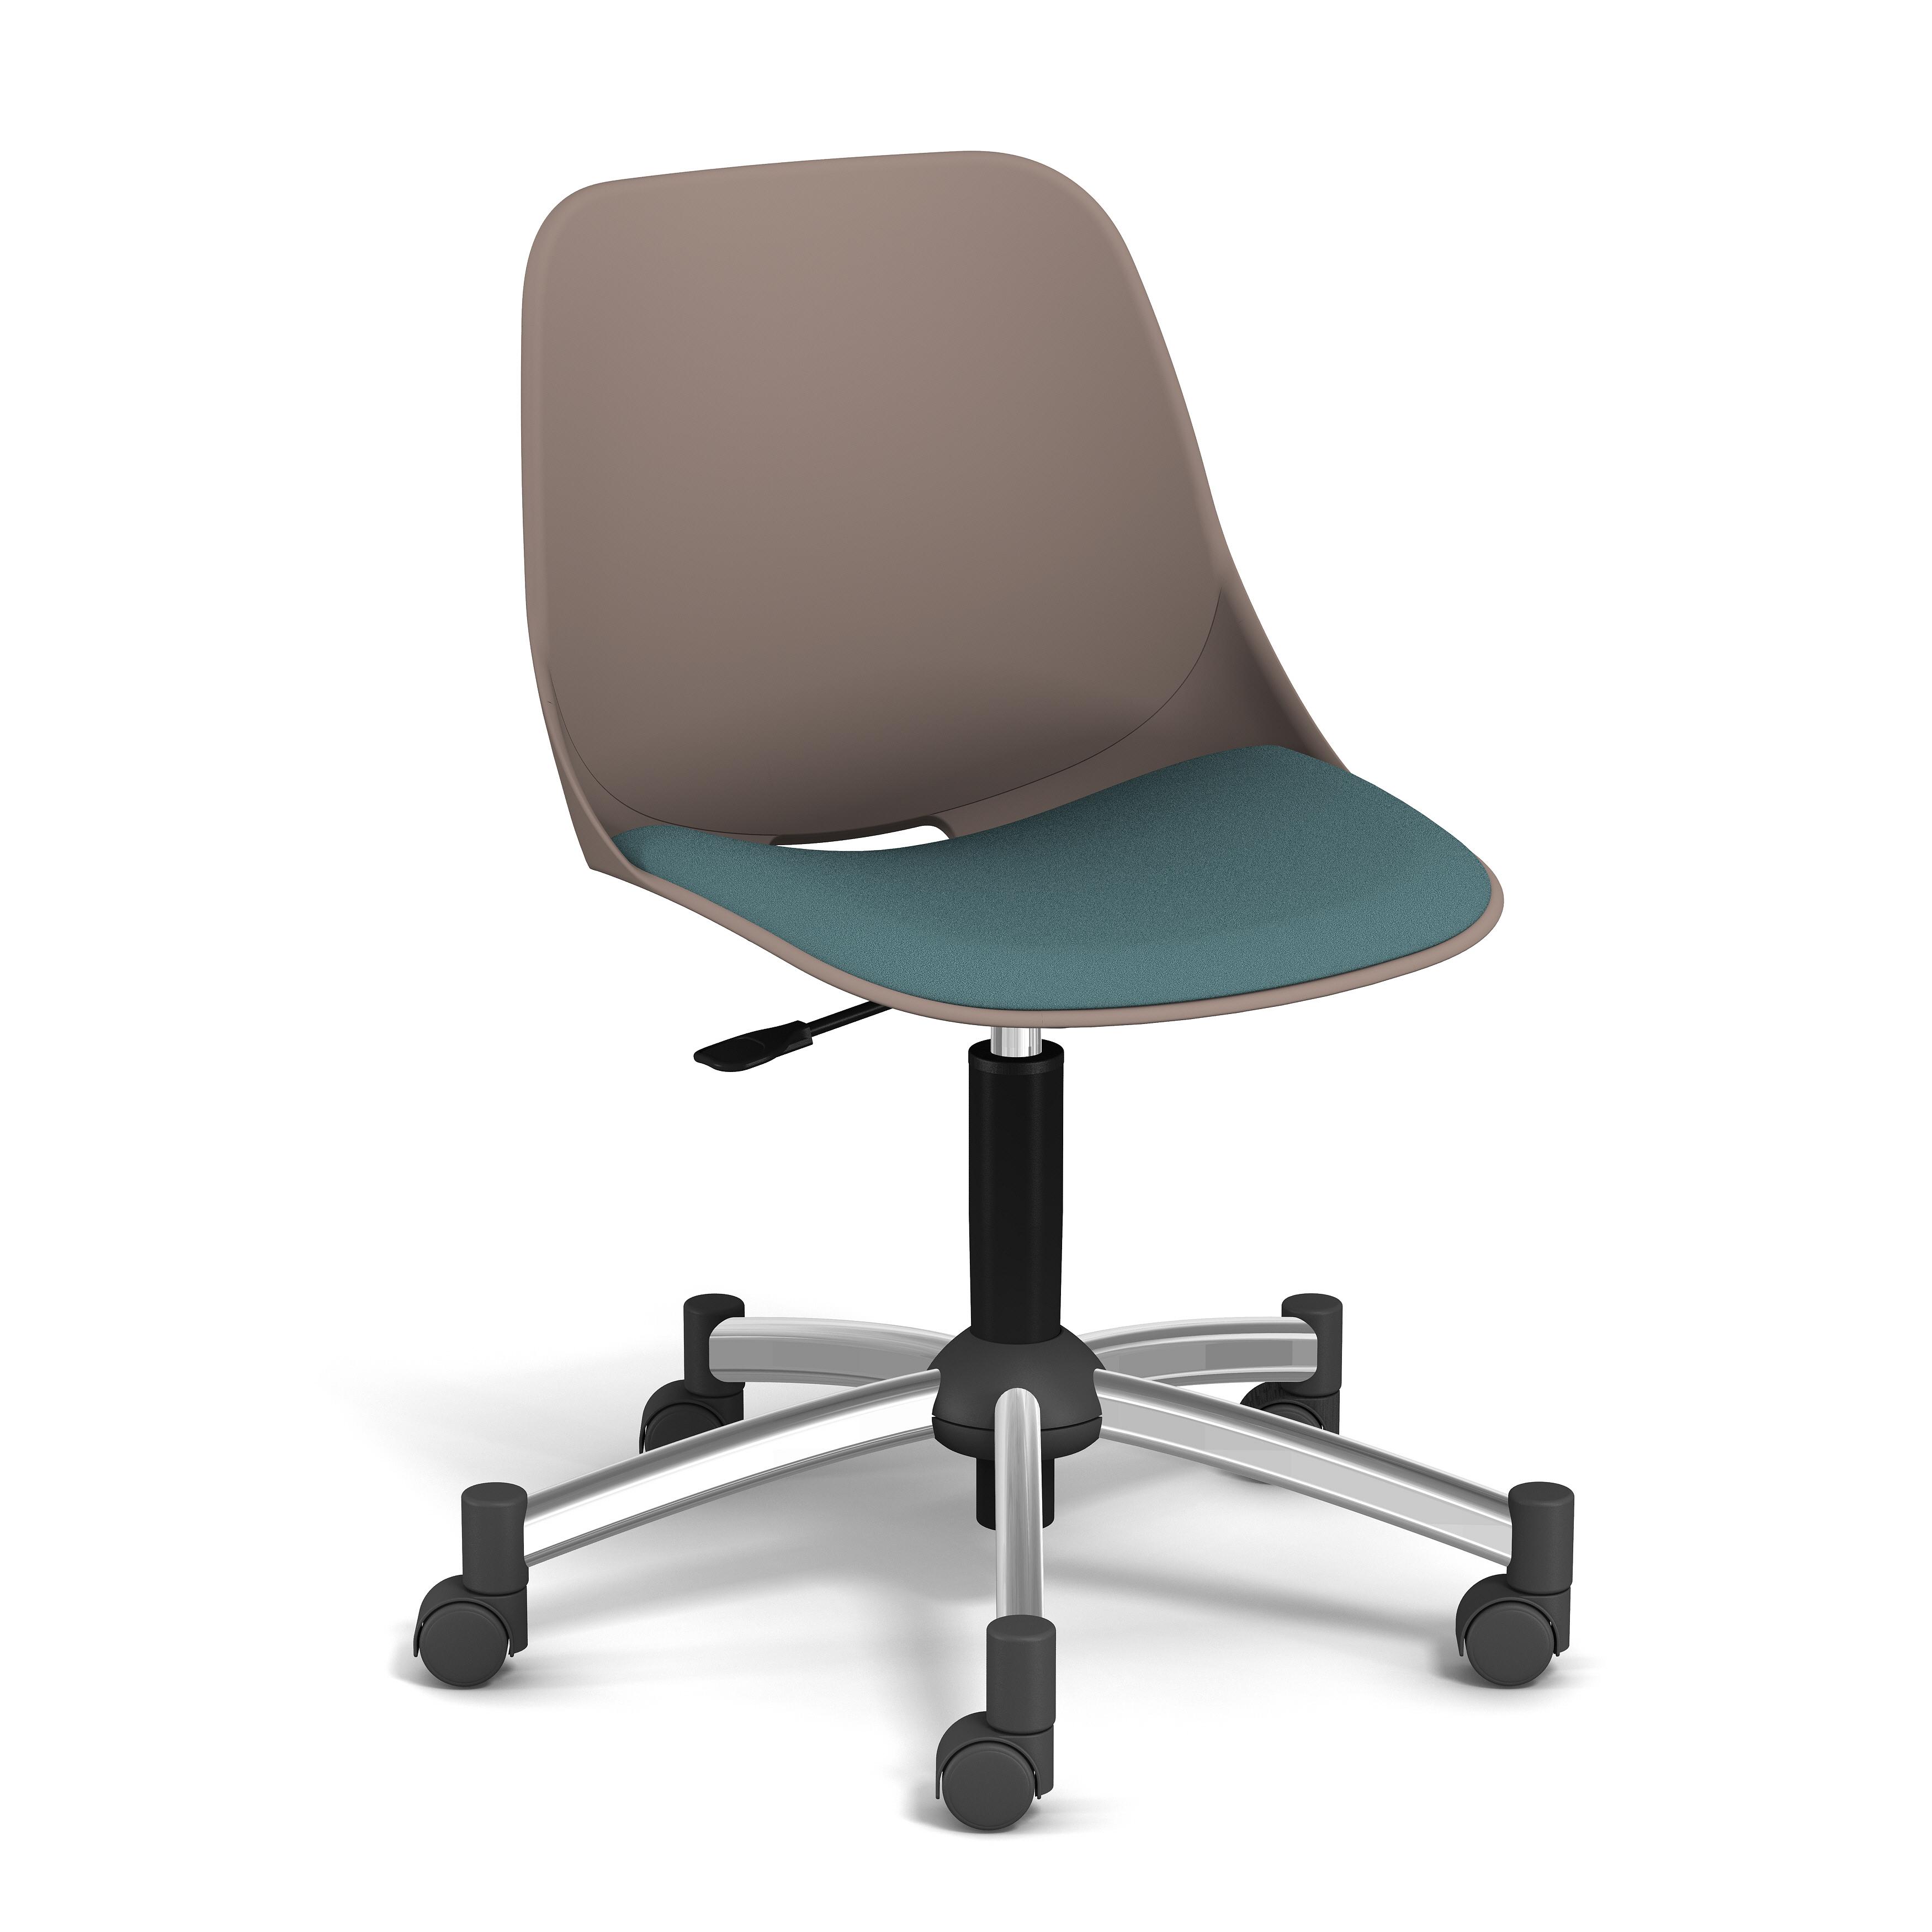 Chaise PALM - coque taupe - assise vert - base chromé